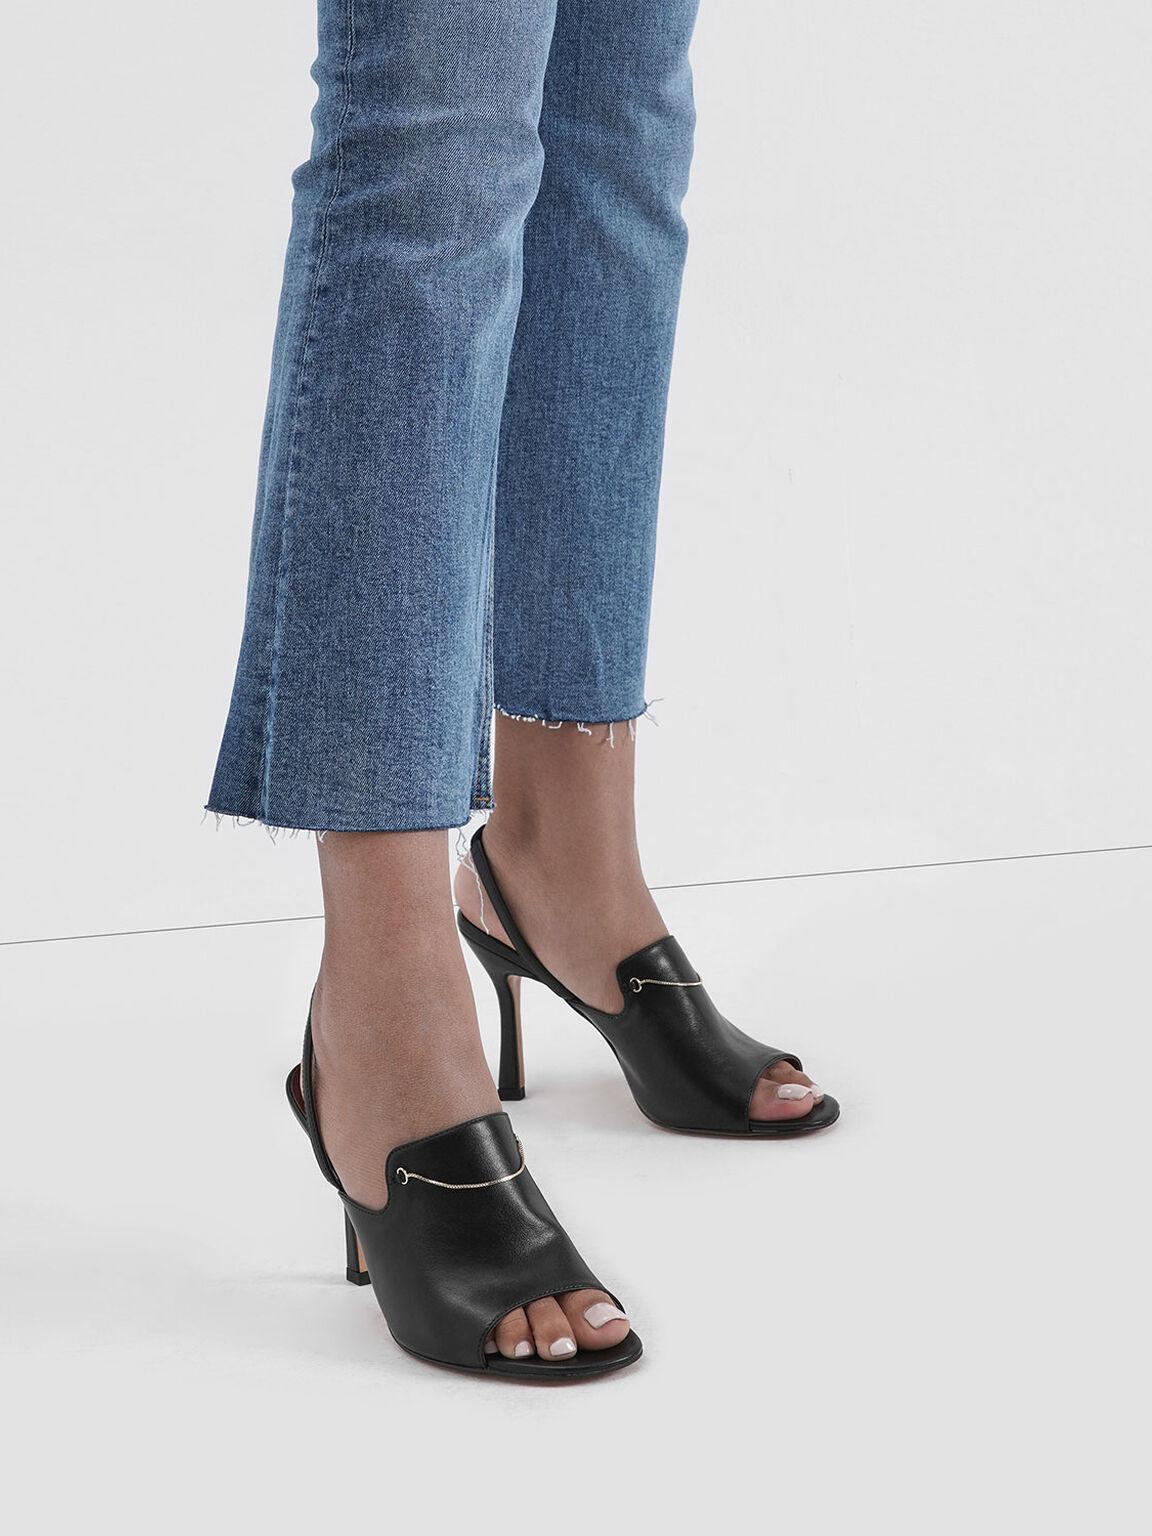 Chain Link Slingback Heels, Black, hi-res